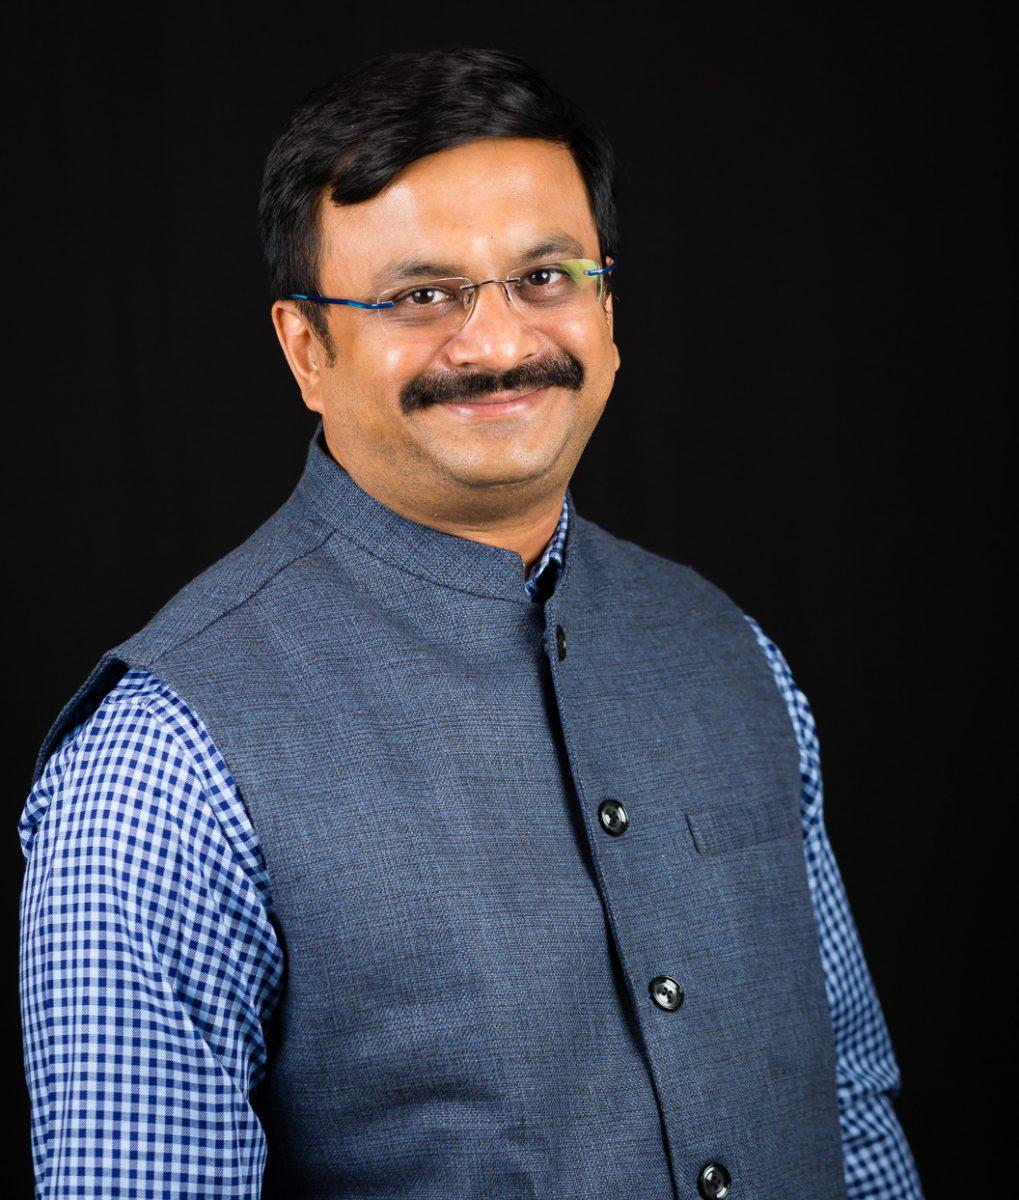 Profile Picture - Venkatarangan Thirumalai